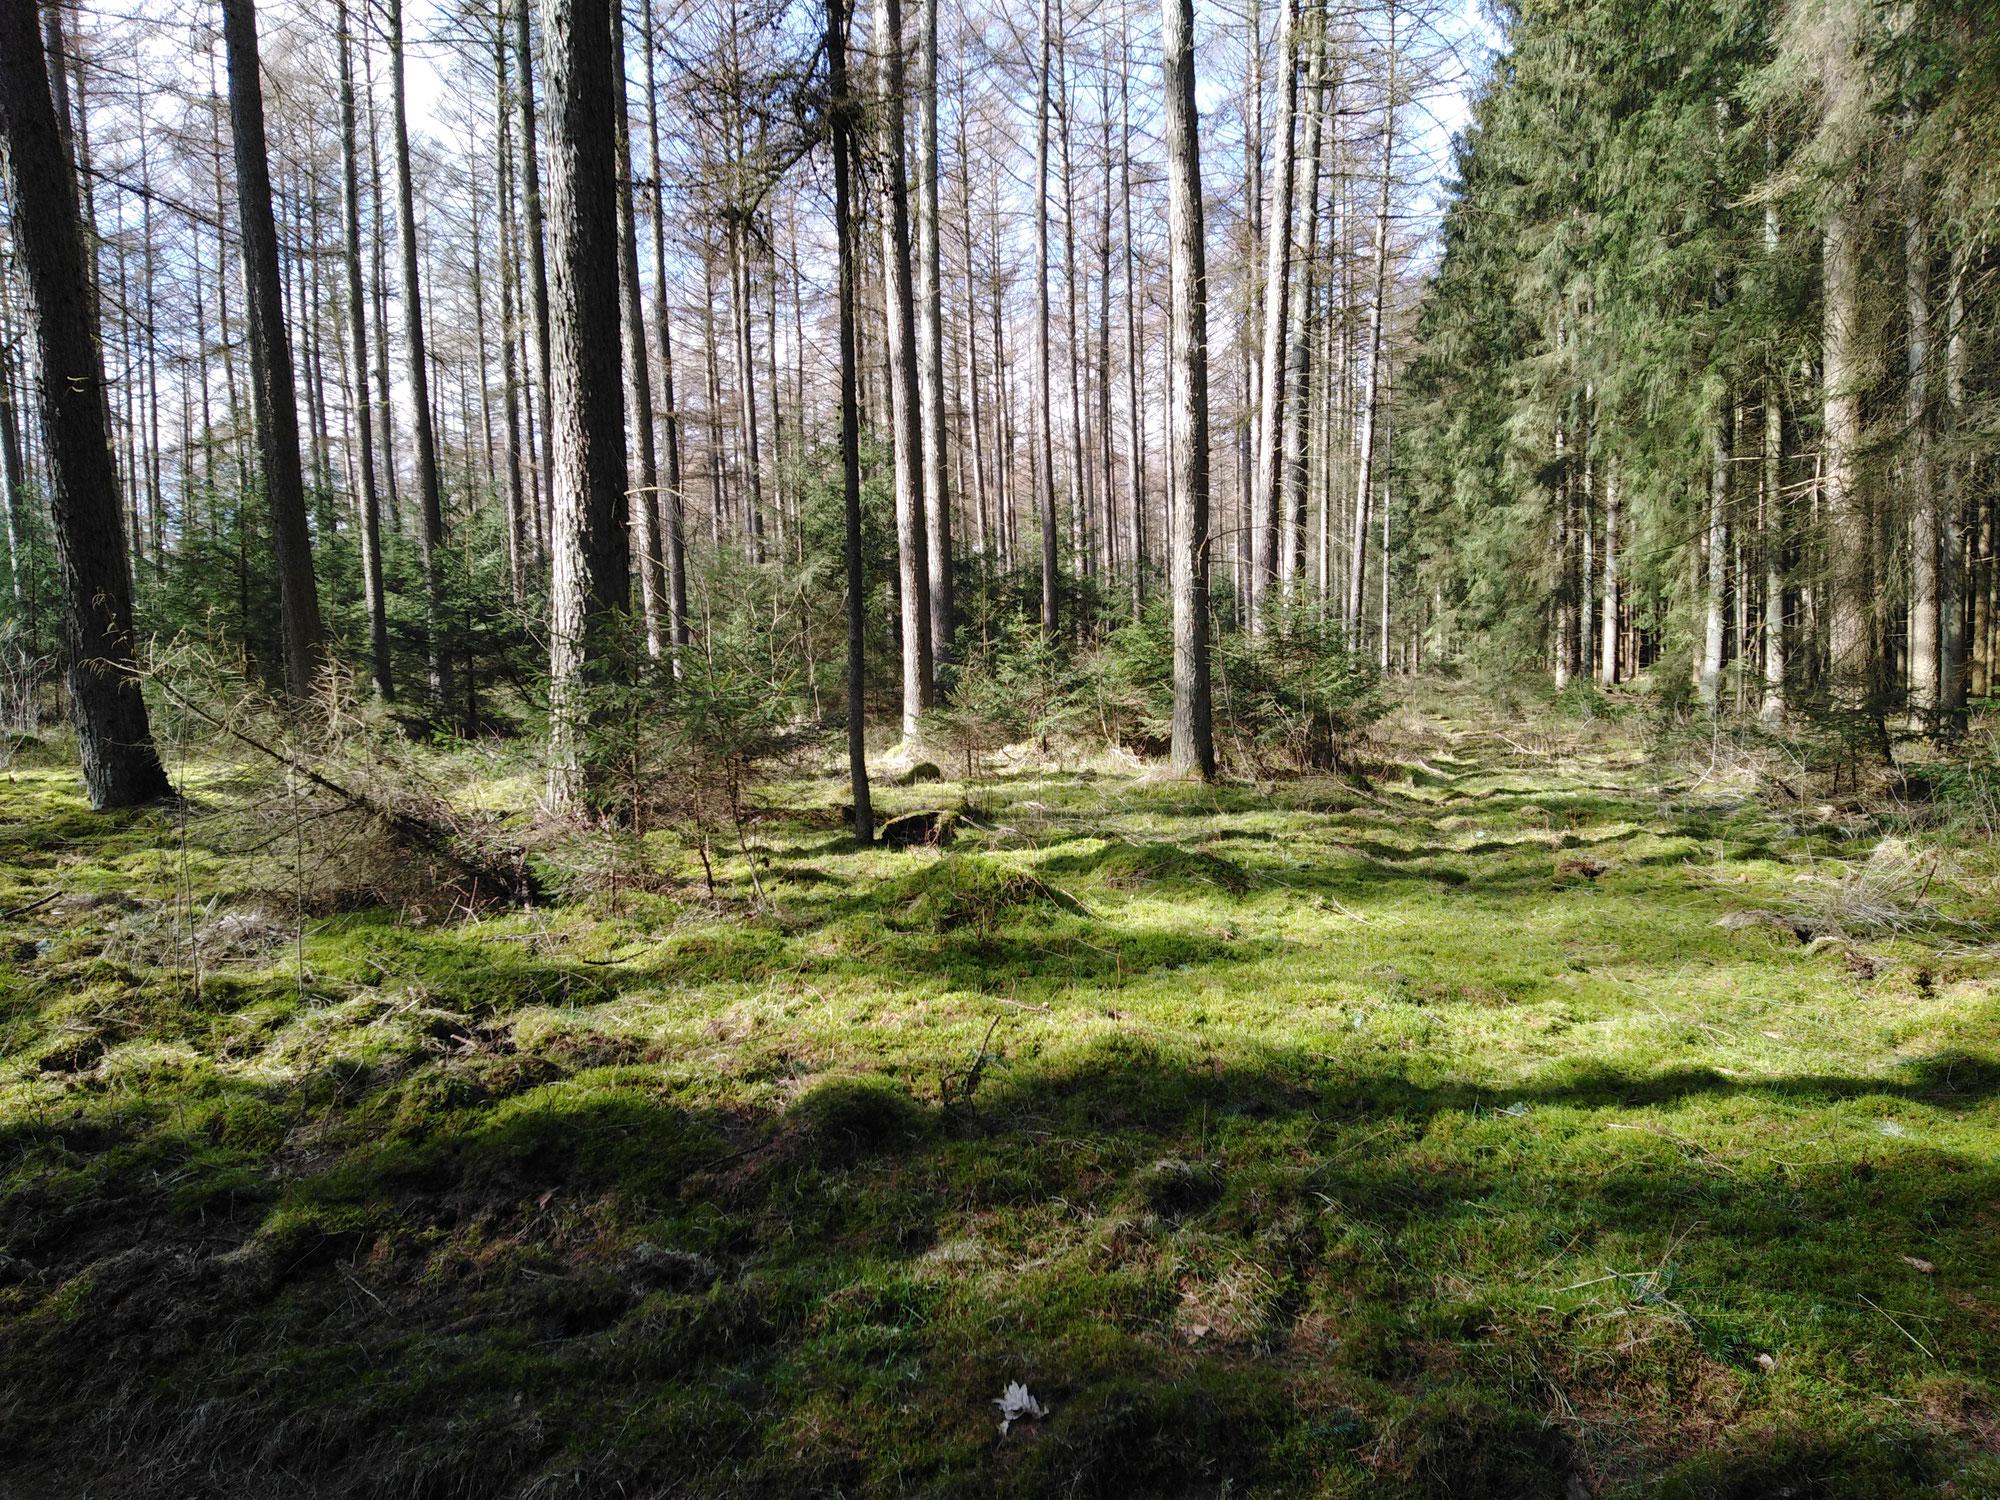 Traumreise - oder Lüneburger Heide real